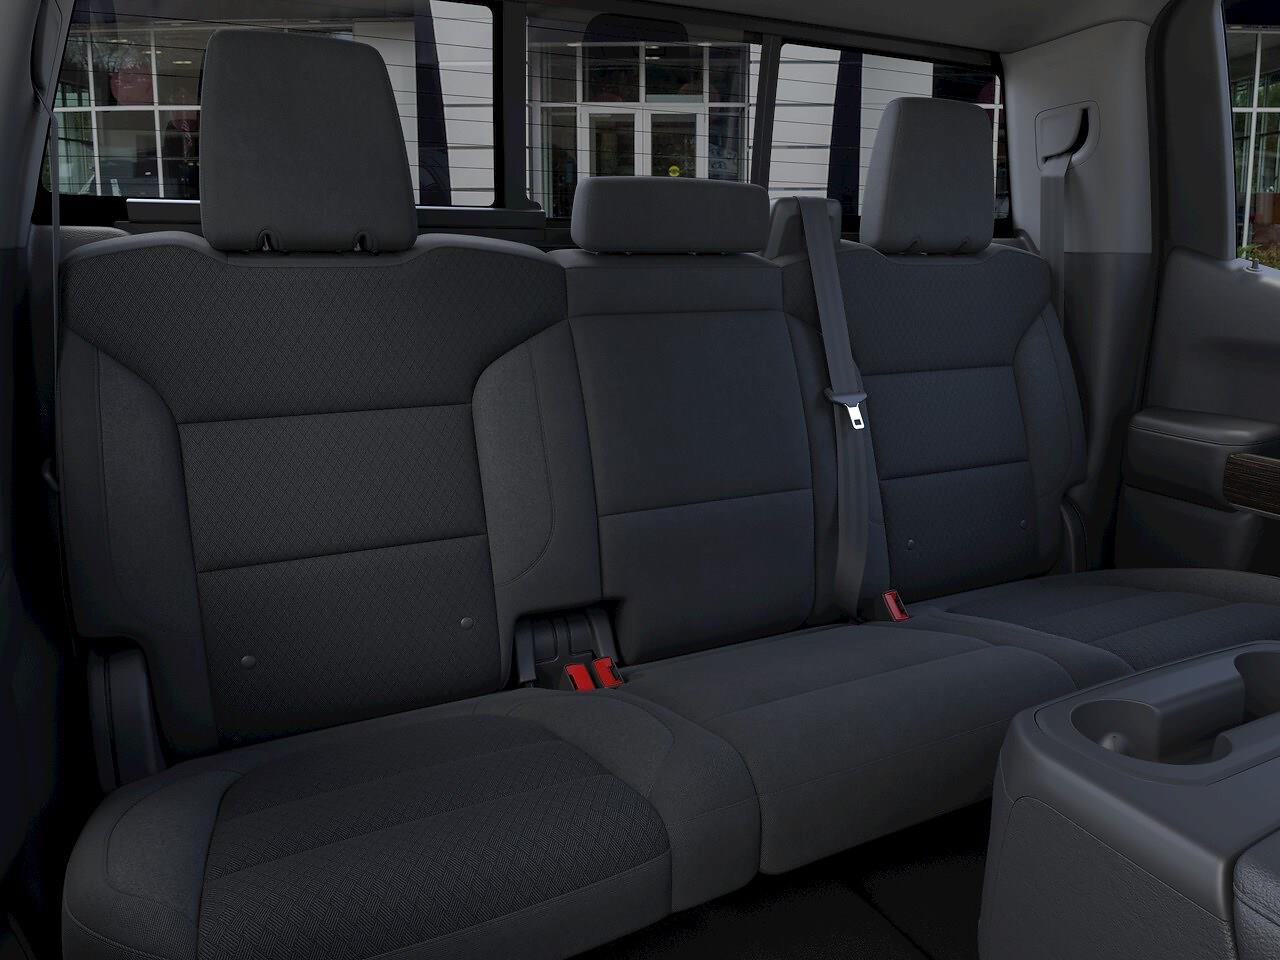 2021 GMC Sierra 1500 Double Cab 4x4, Pickup #243372 - photo 14